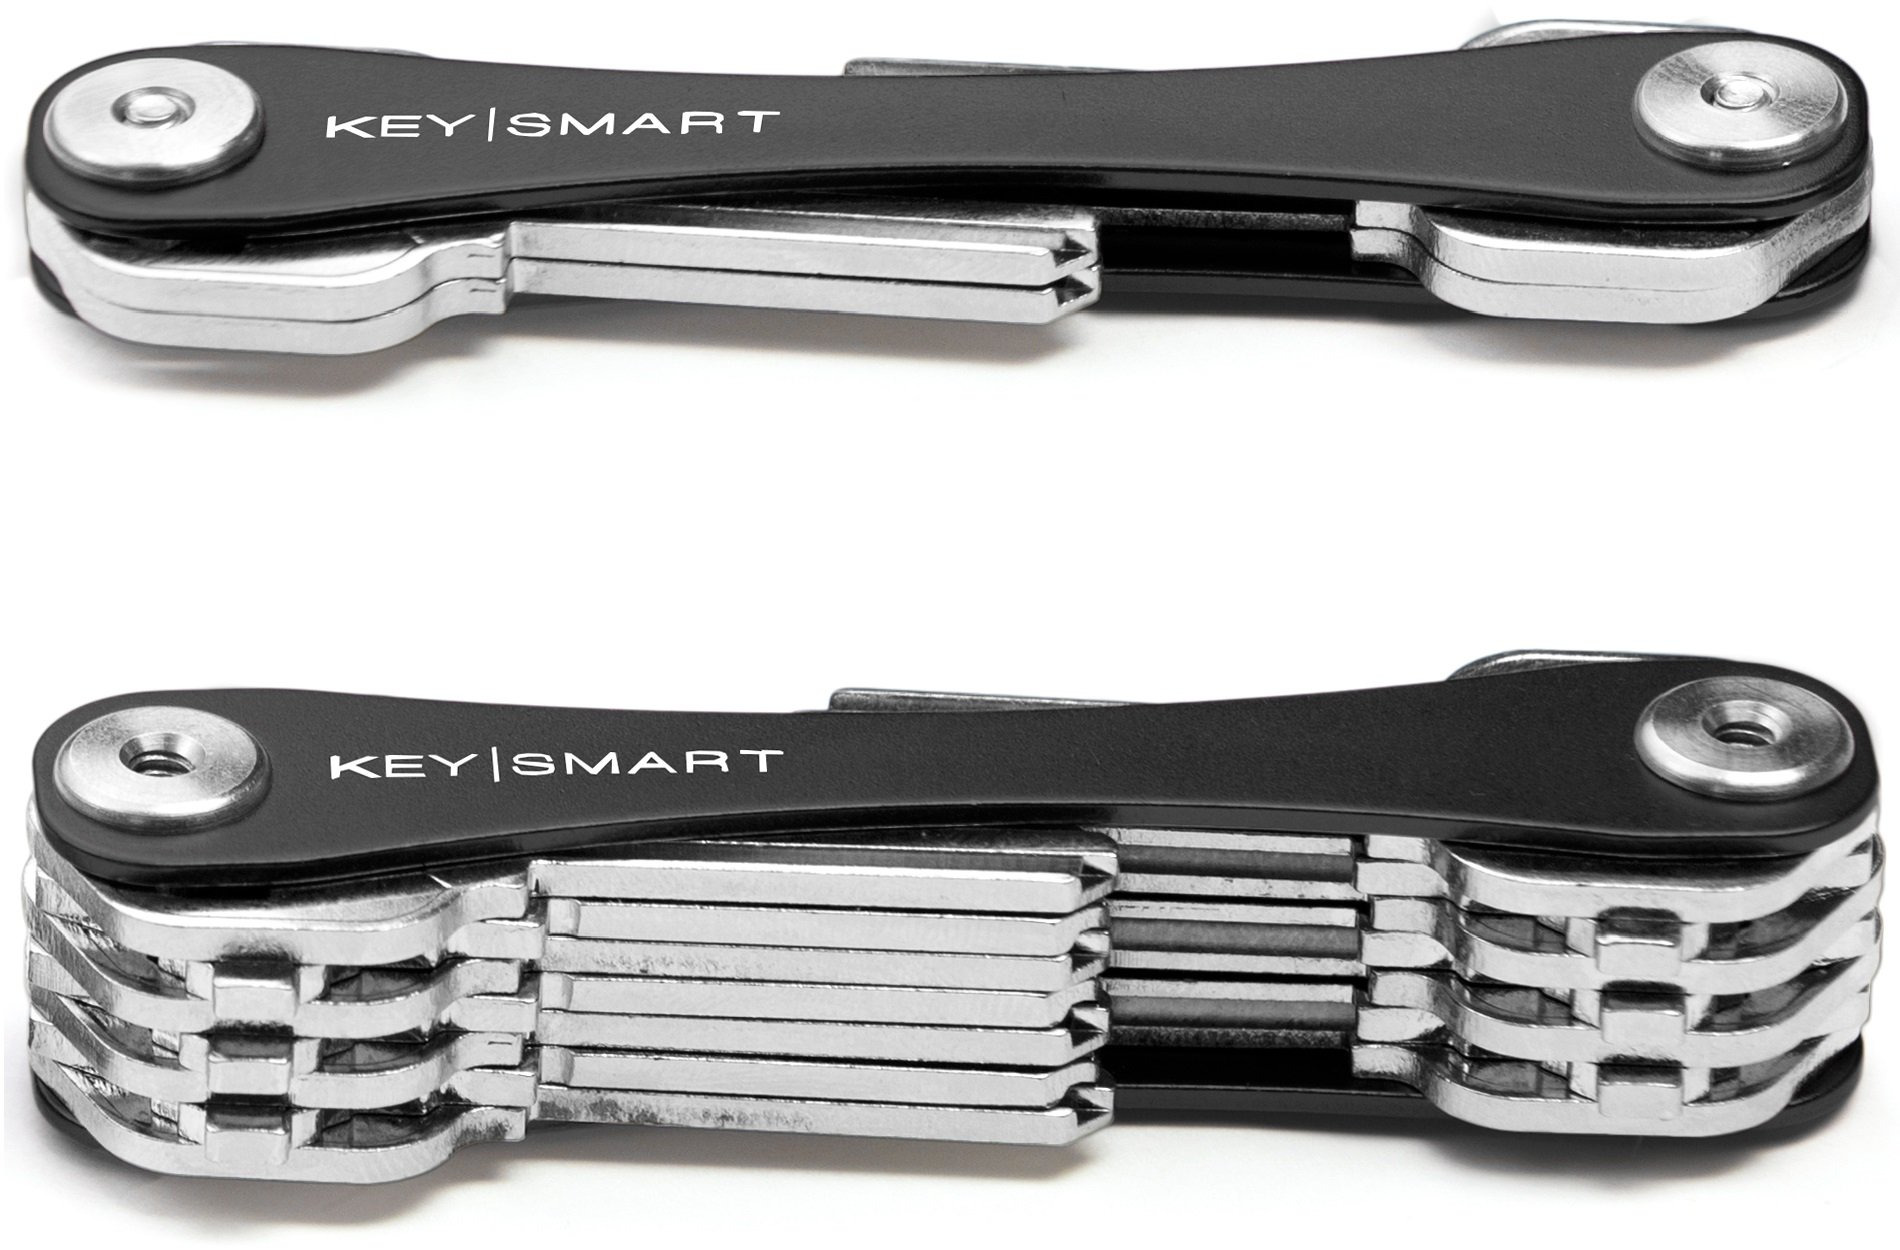 KeySmart - Compact Key Holder and Keychain Organizer (up to 22 Keys, Black)